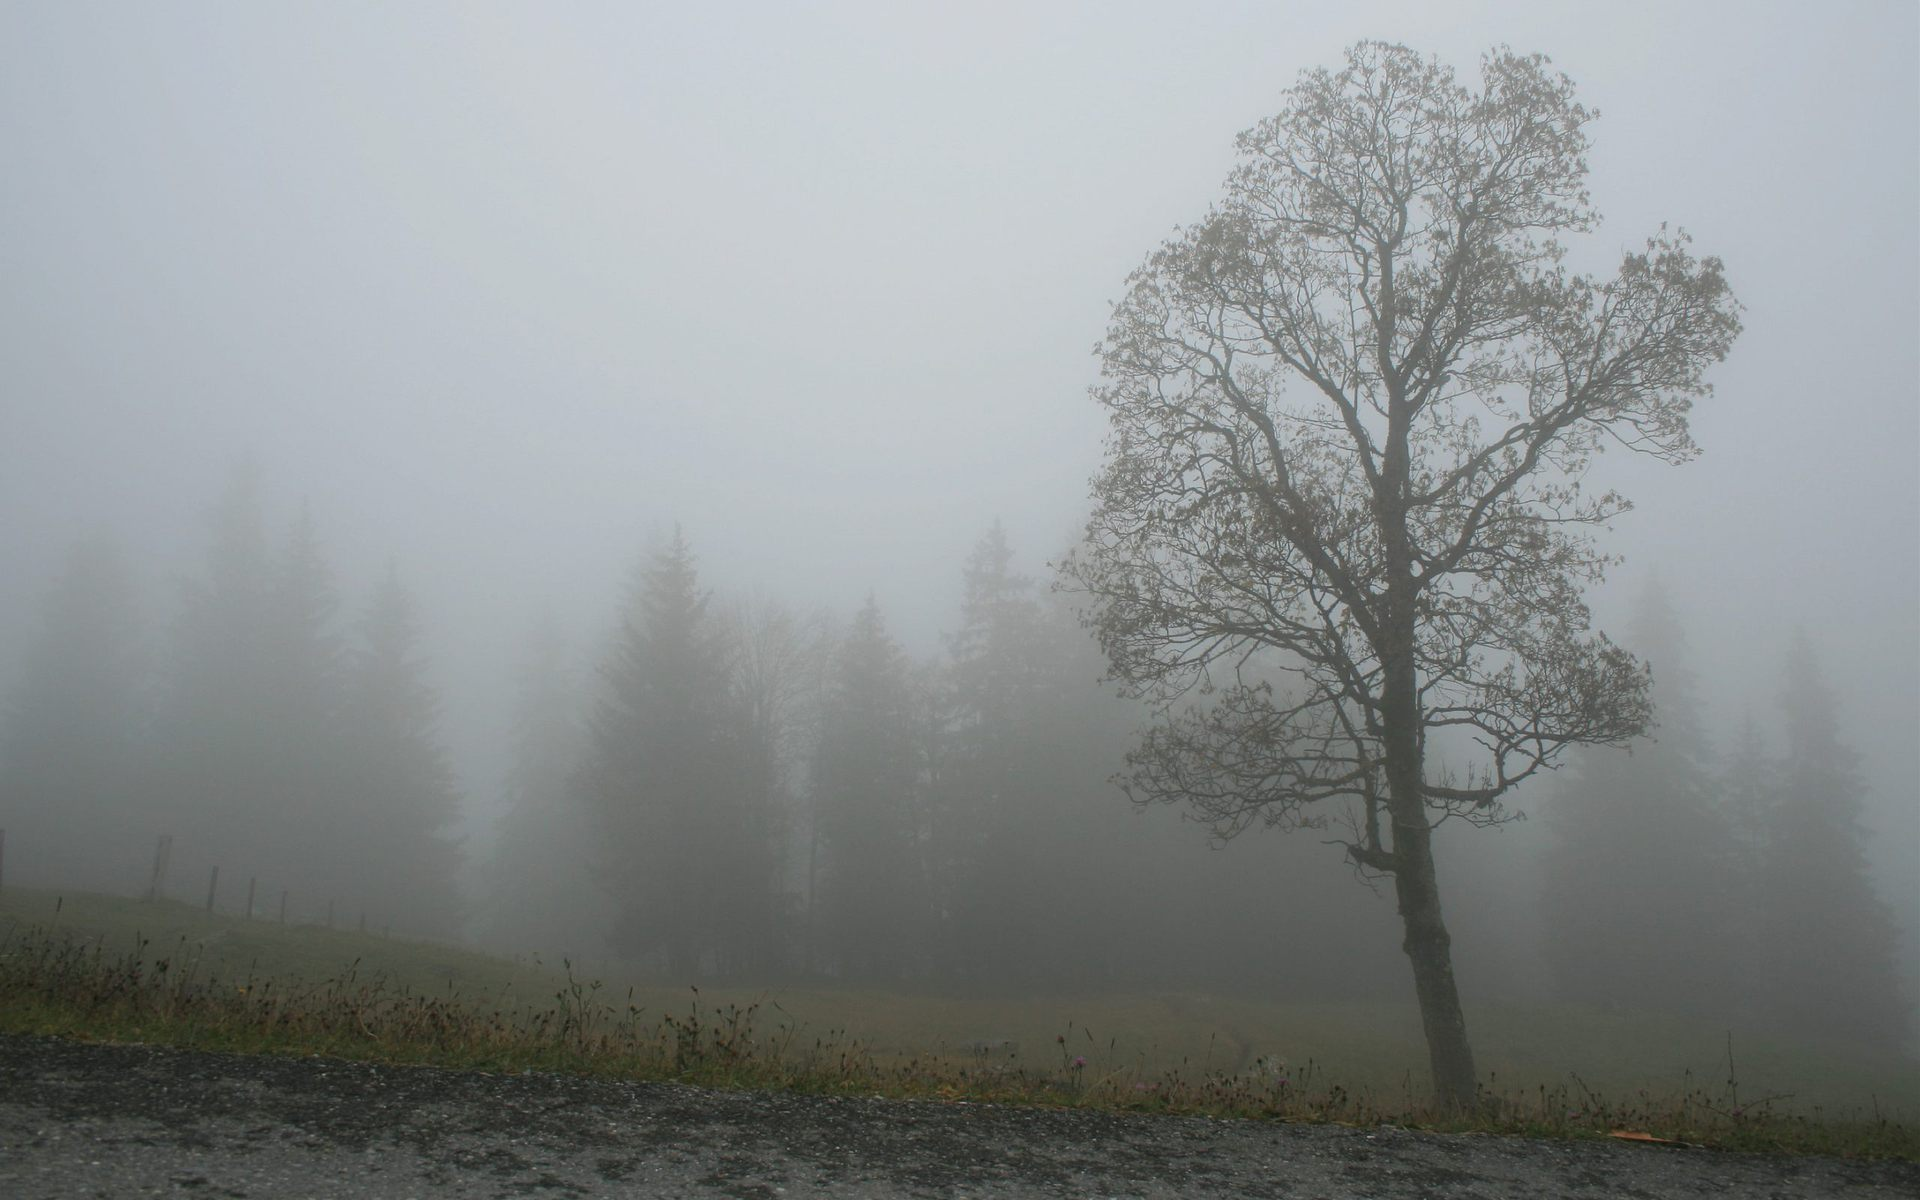 картинки сильного тумана особенностью